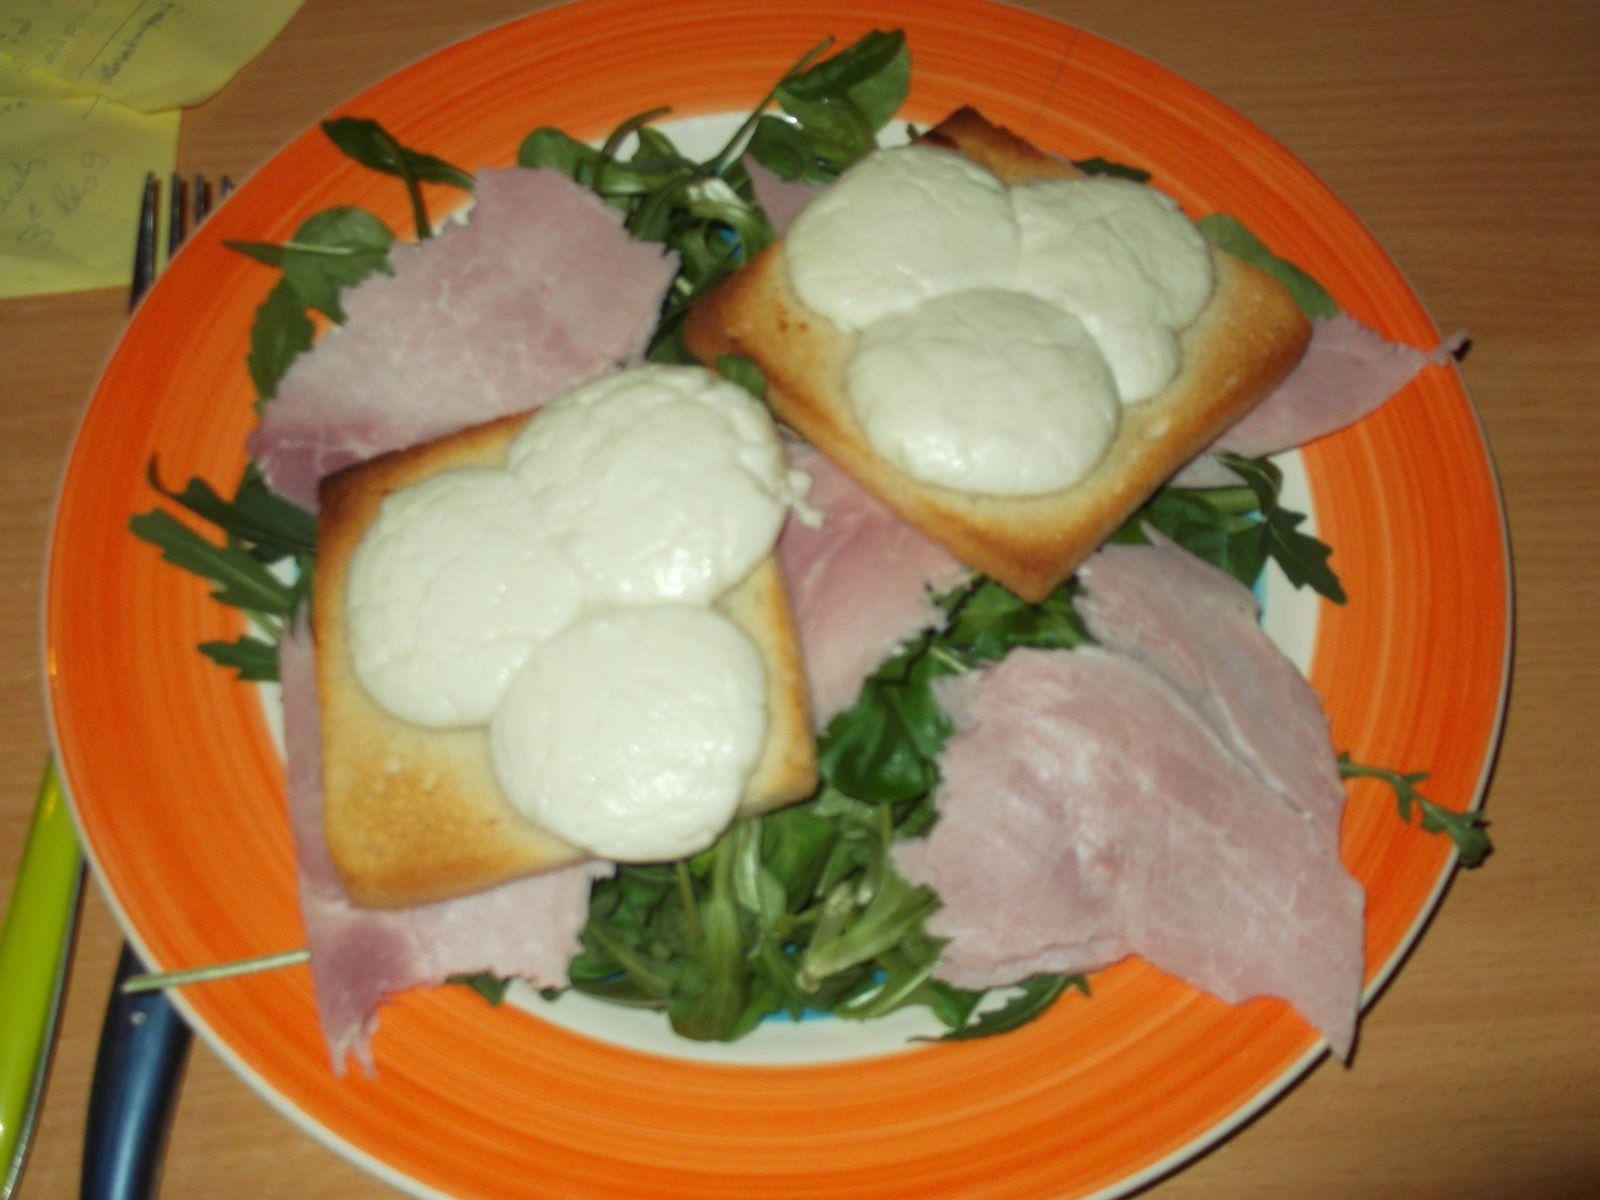 salade + jambon + toasts au chevre